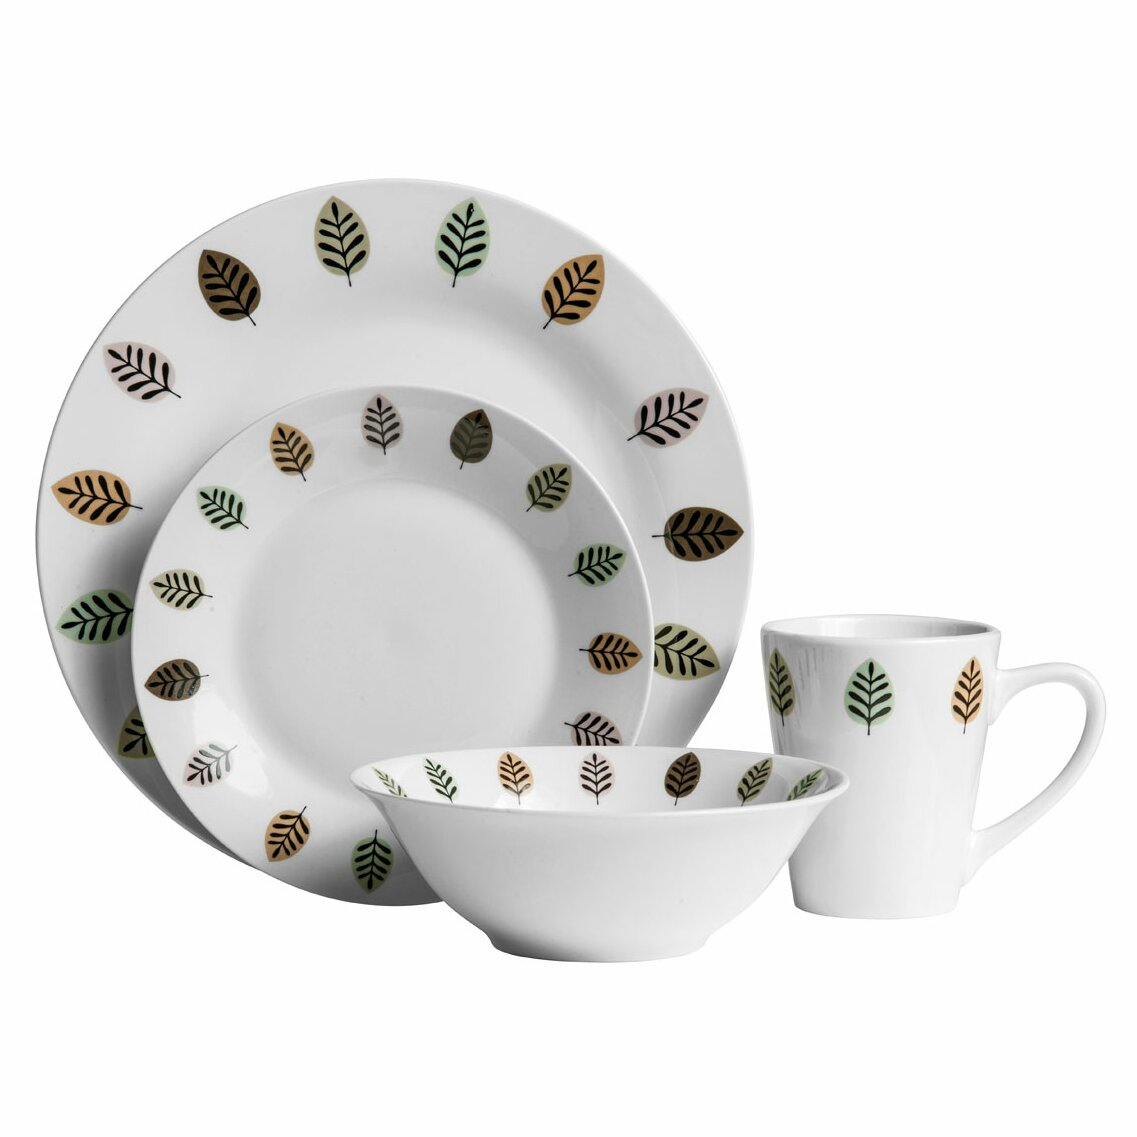 Castleton Home 16 Piece Porcelain Dinnerware Set Amp Reviews